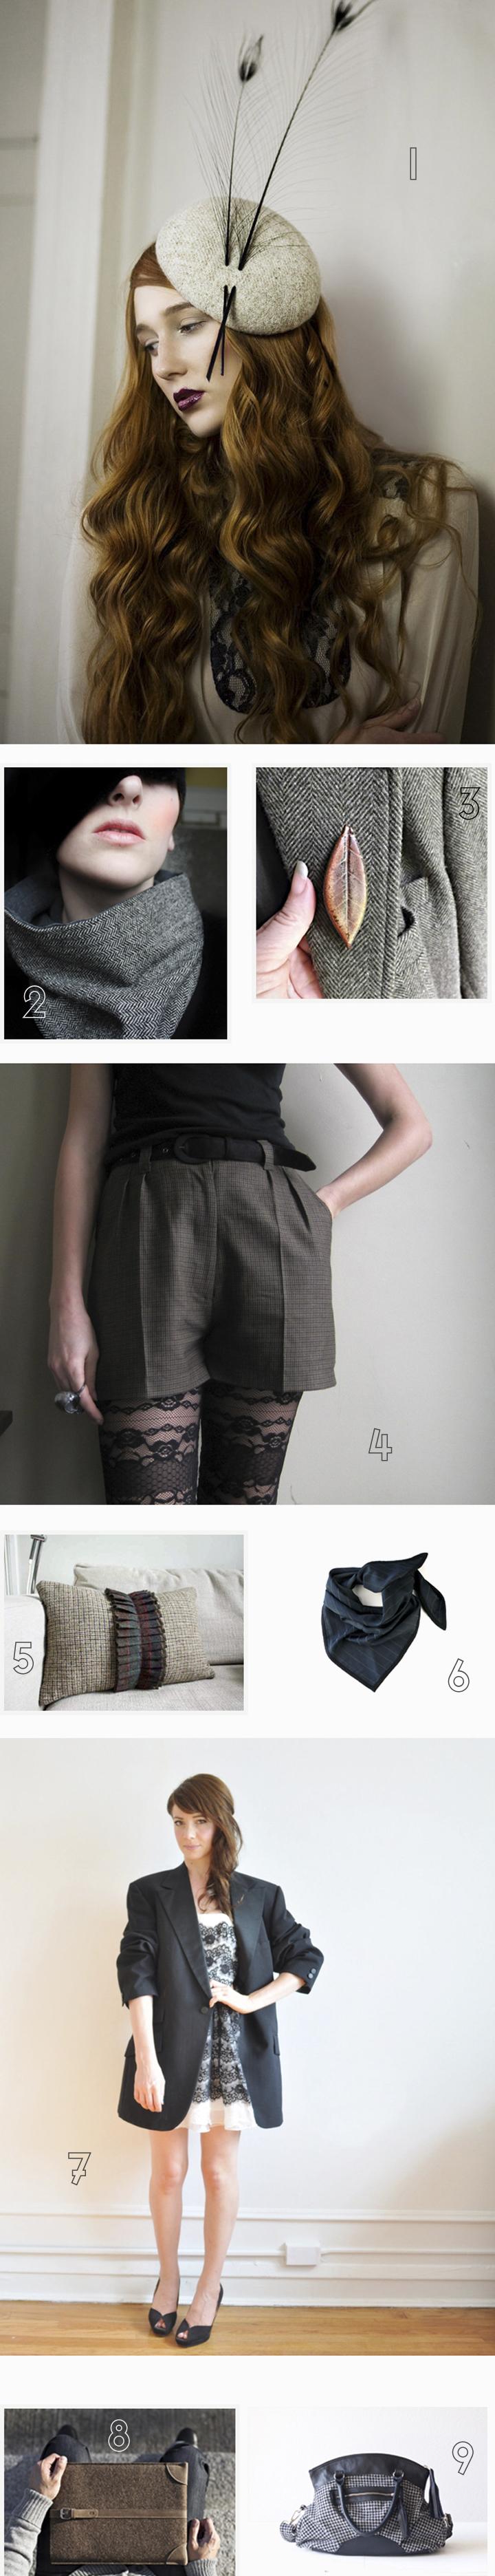 menswear.fall.2013.jpg